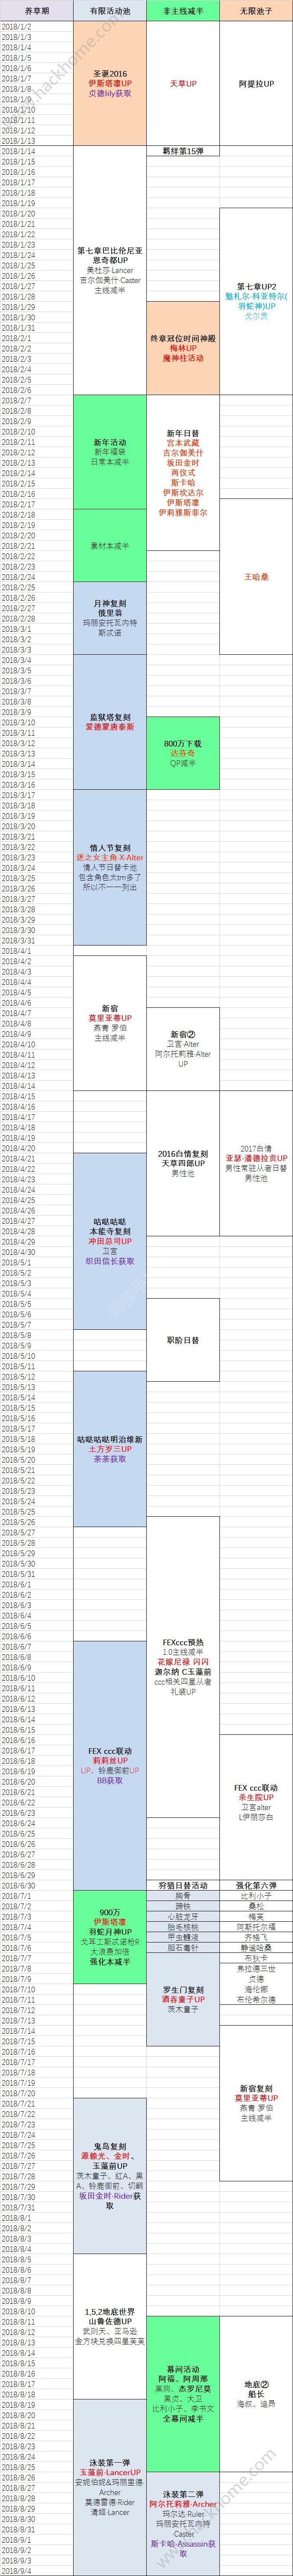 fgo2018活动大全 2018活动时间表[多图]图片1